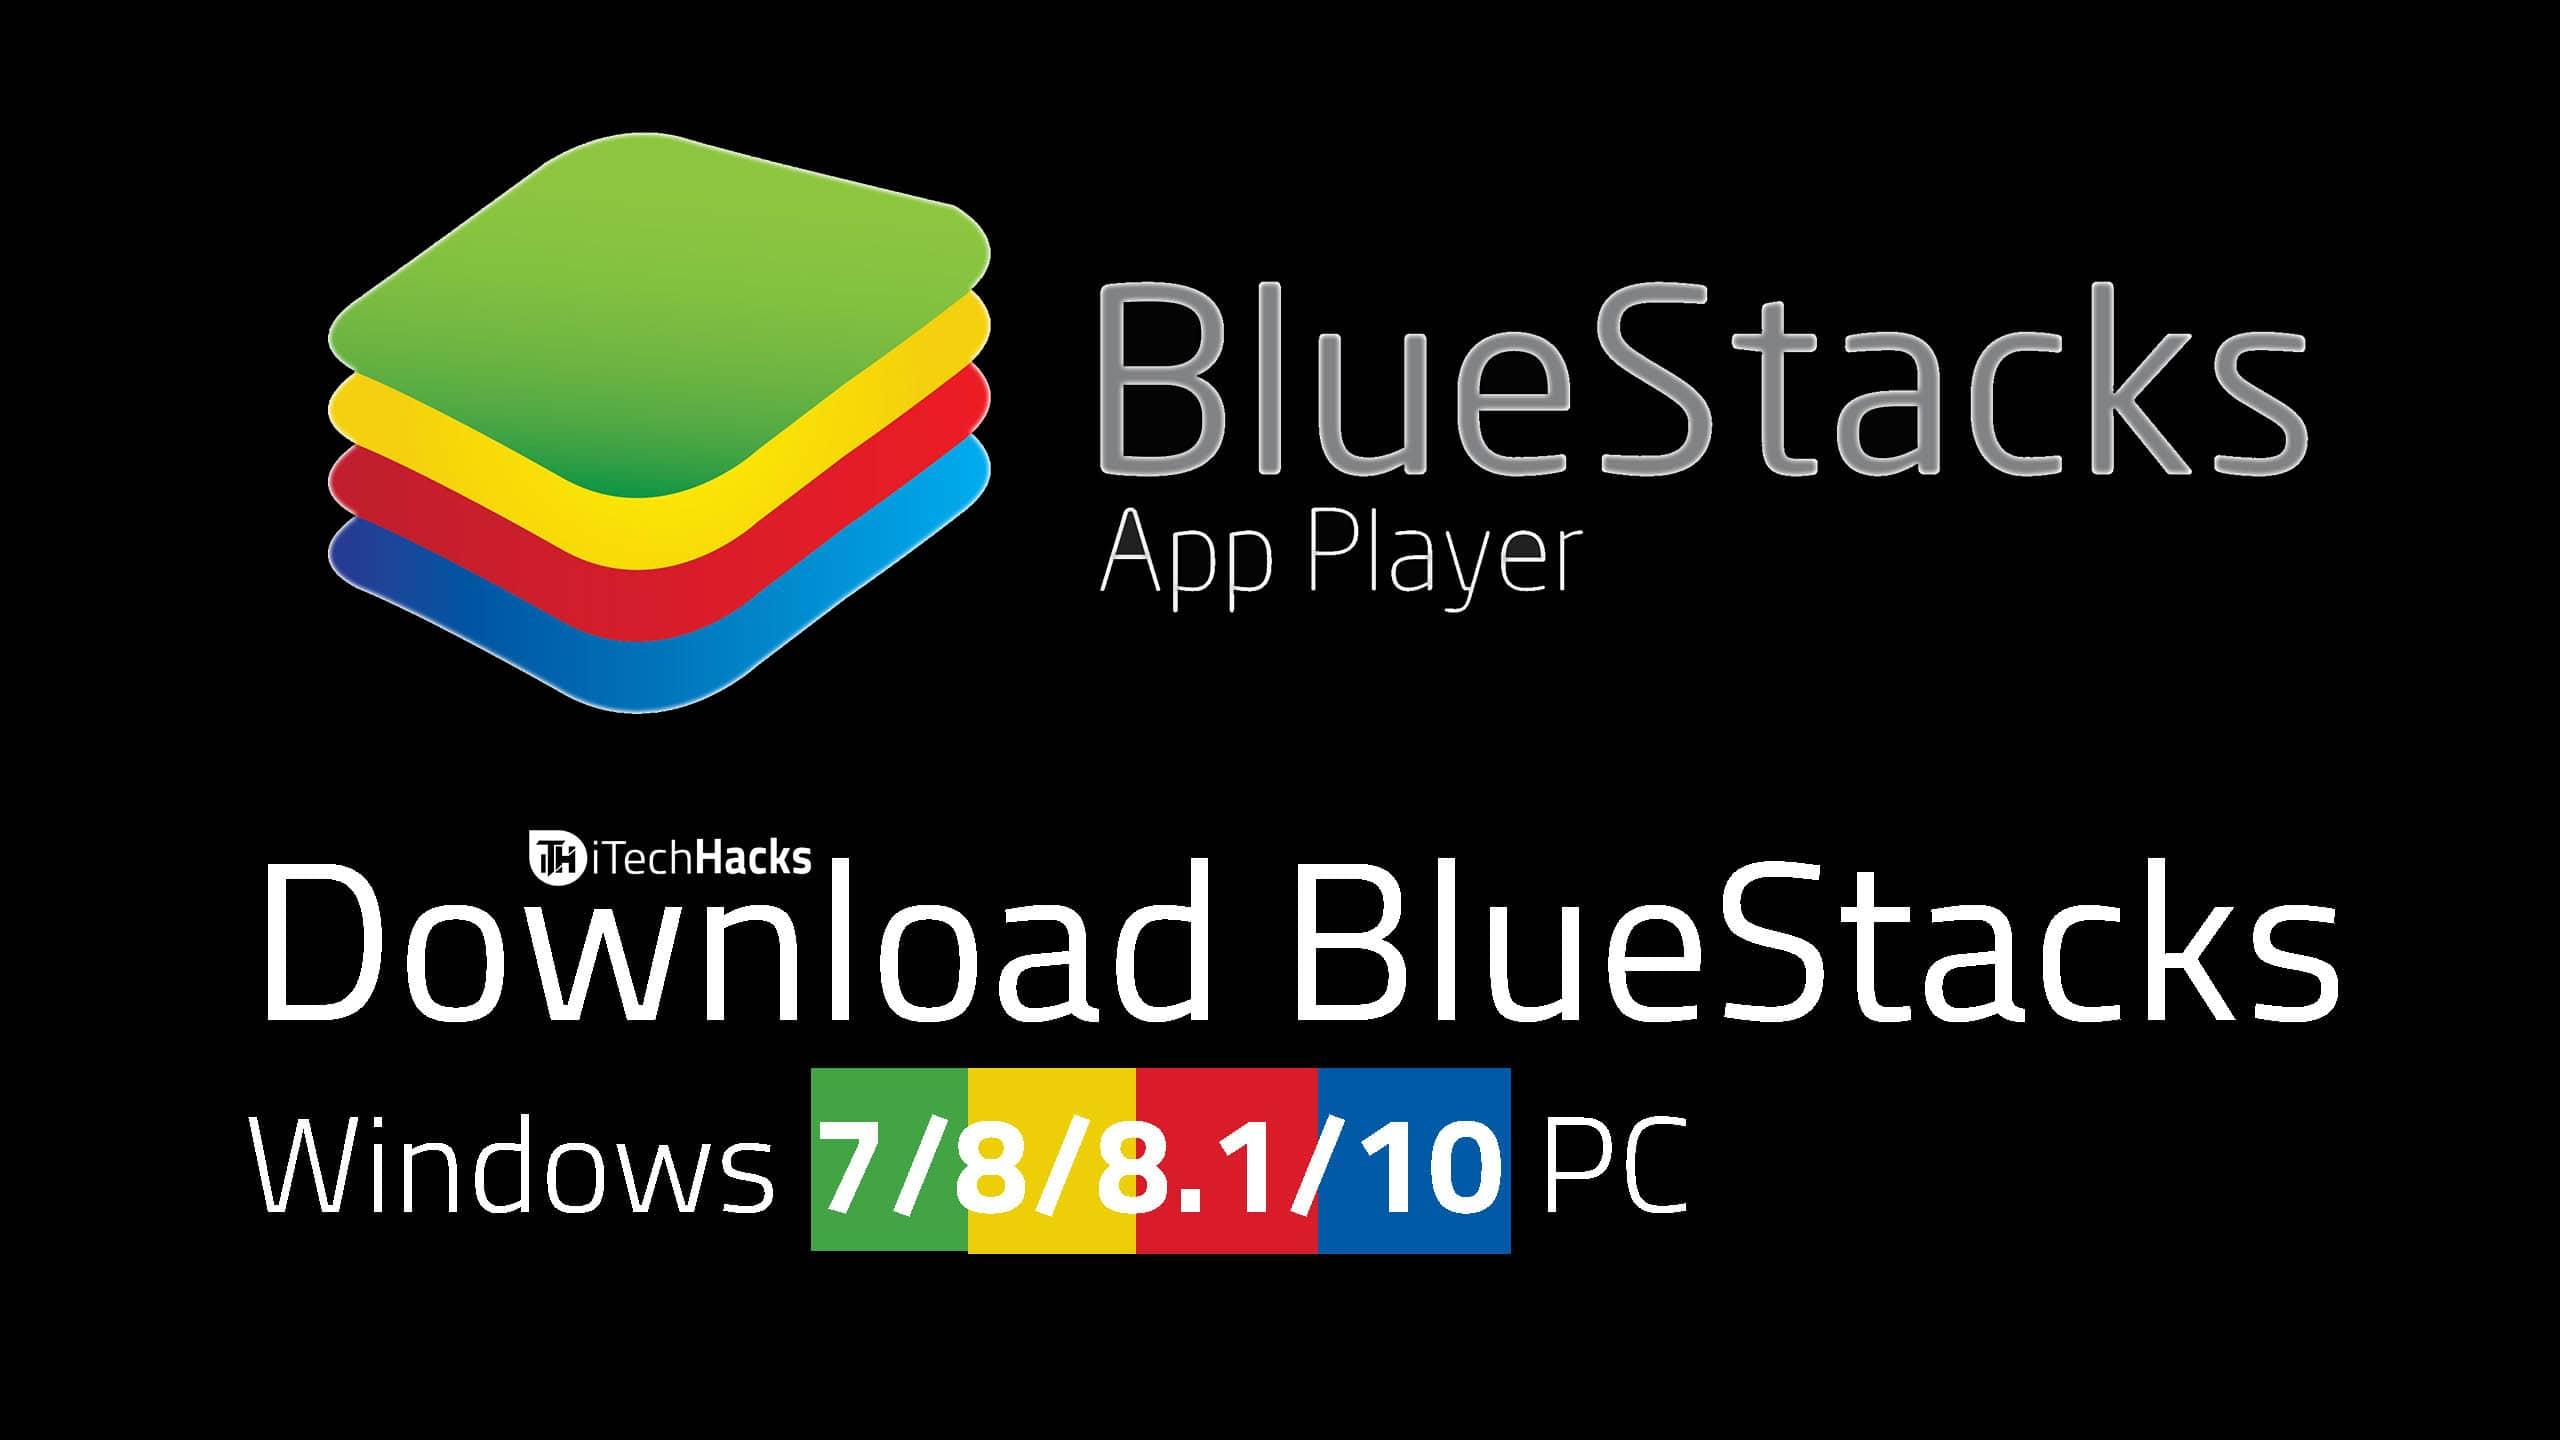 Download Bluestacks App For Windows 7/8/8.1/10